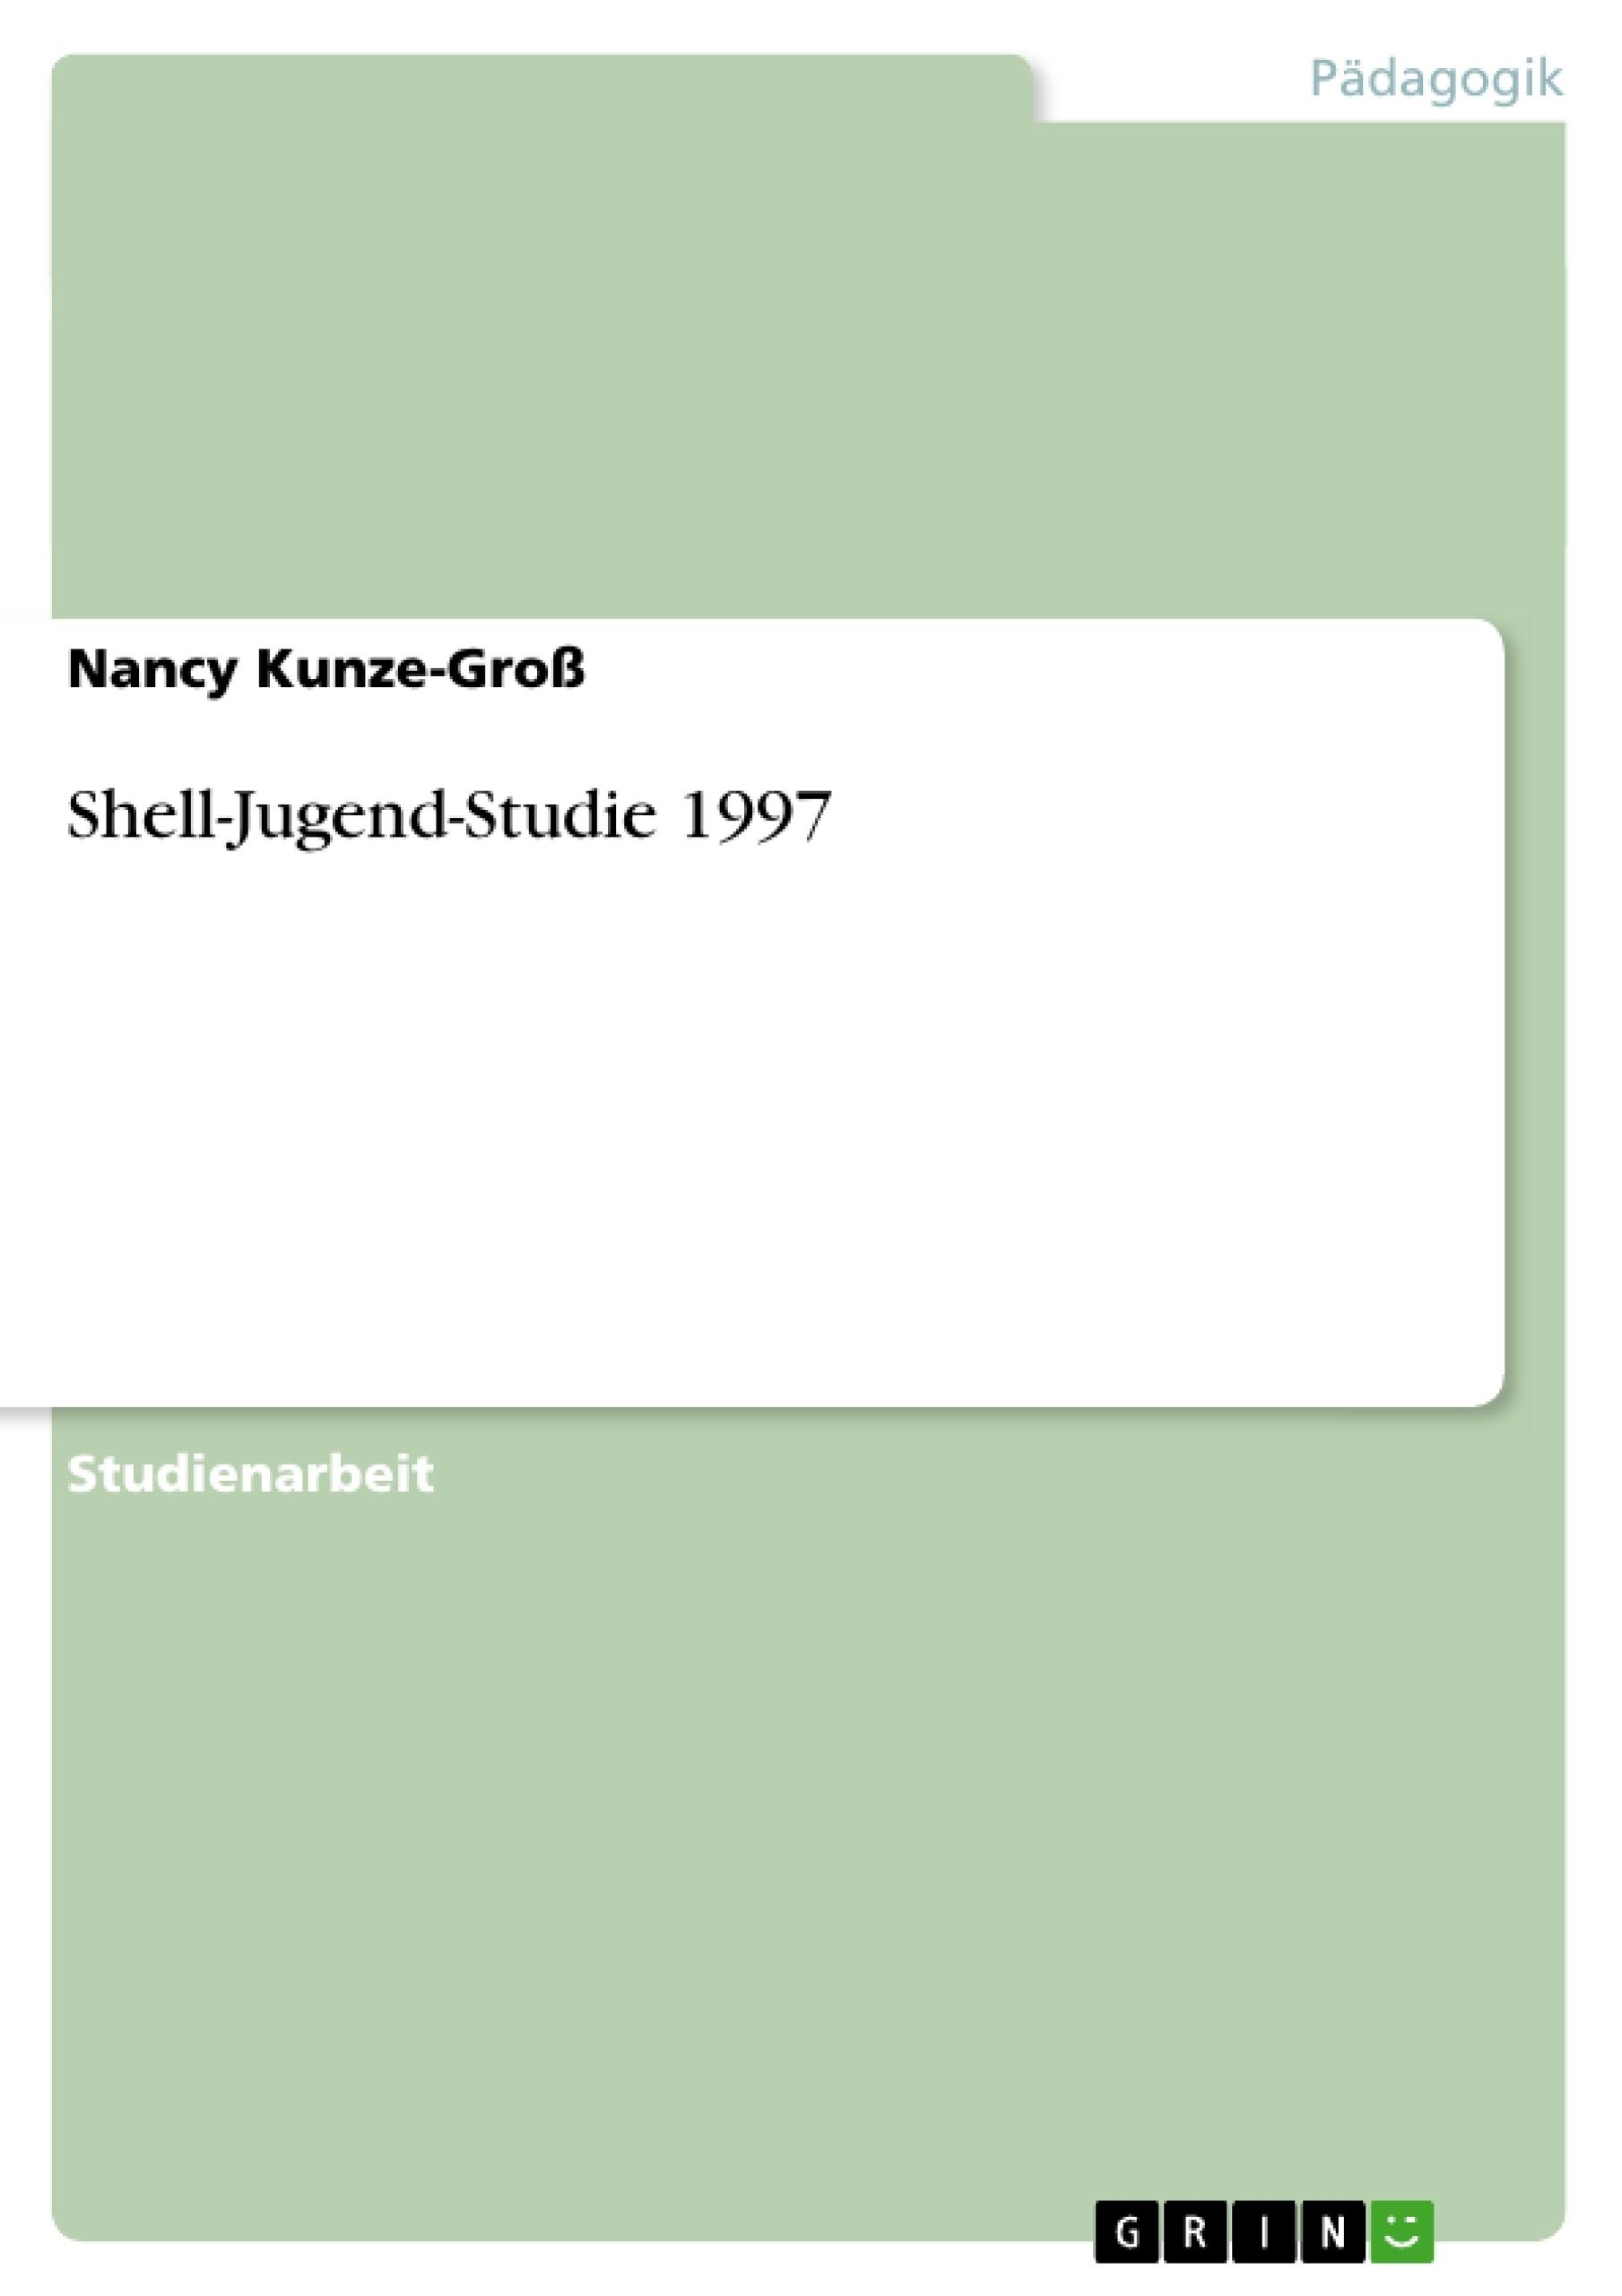 Titel: Shell-Jugend-Studie 1997